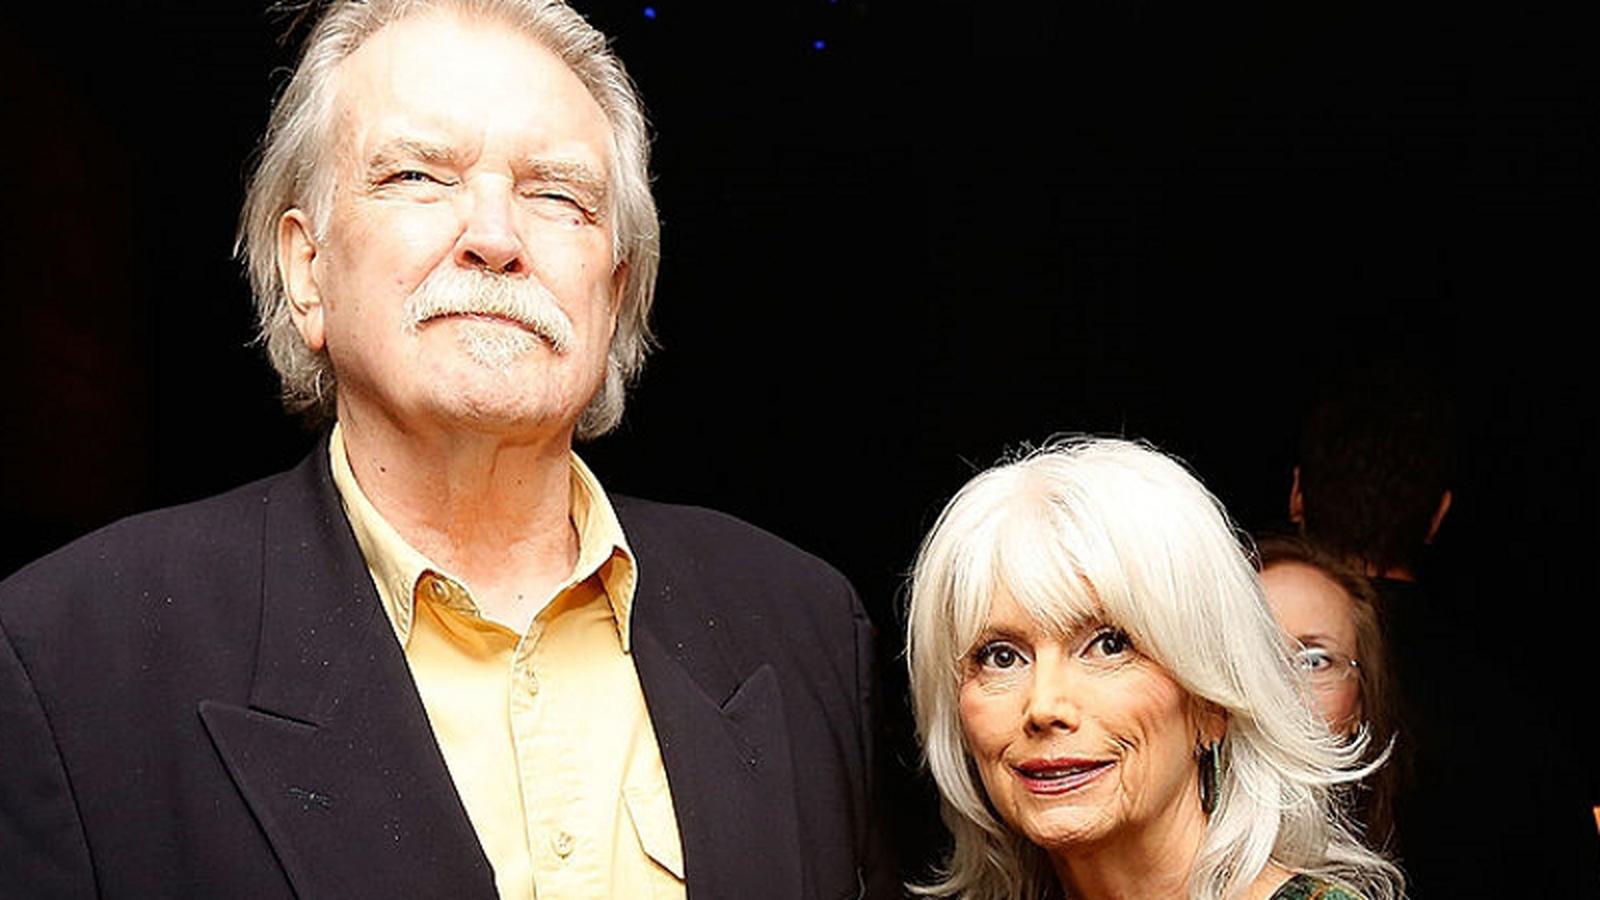 Country Singer Guy Clark Passes Away Aged 74